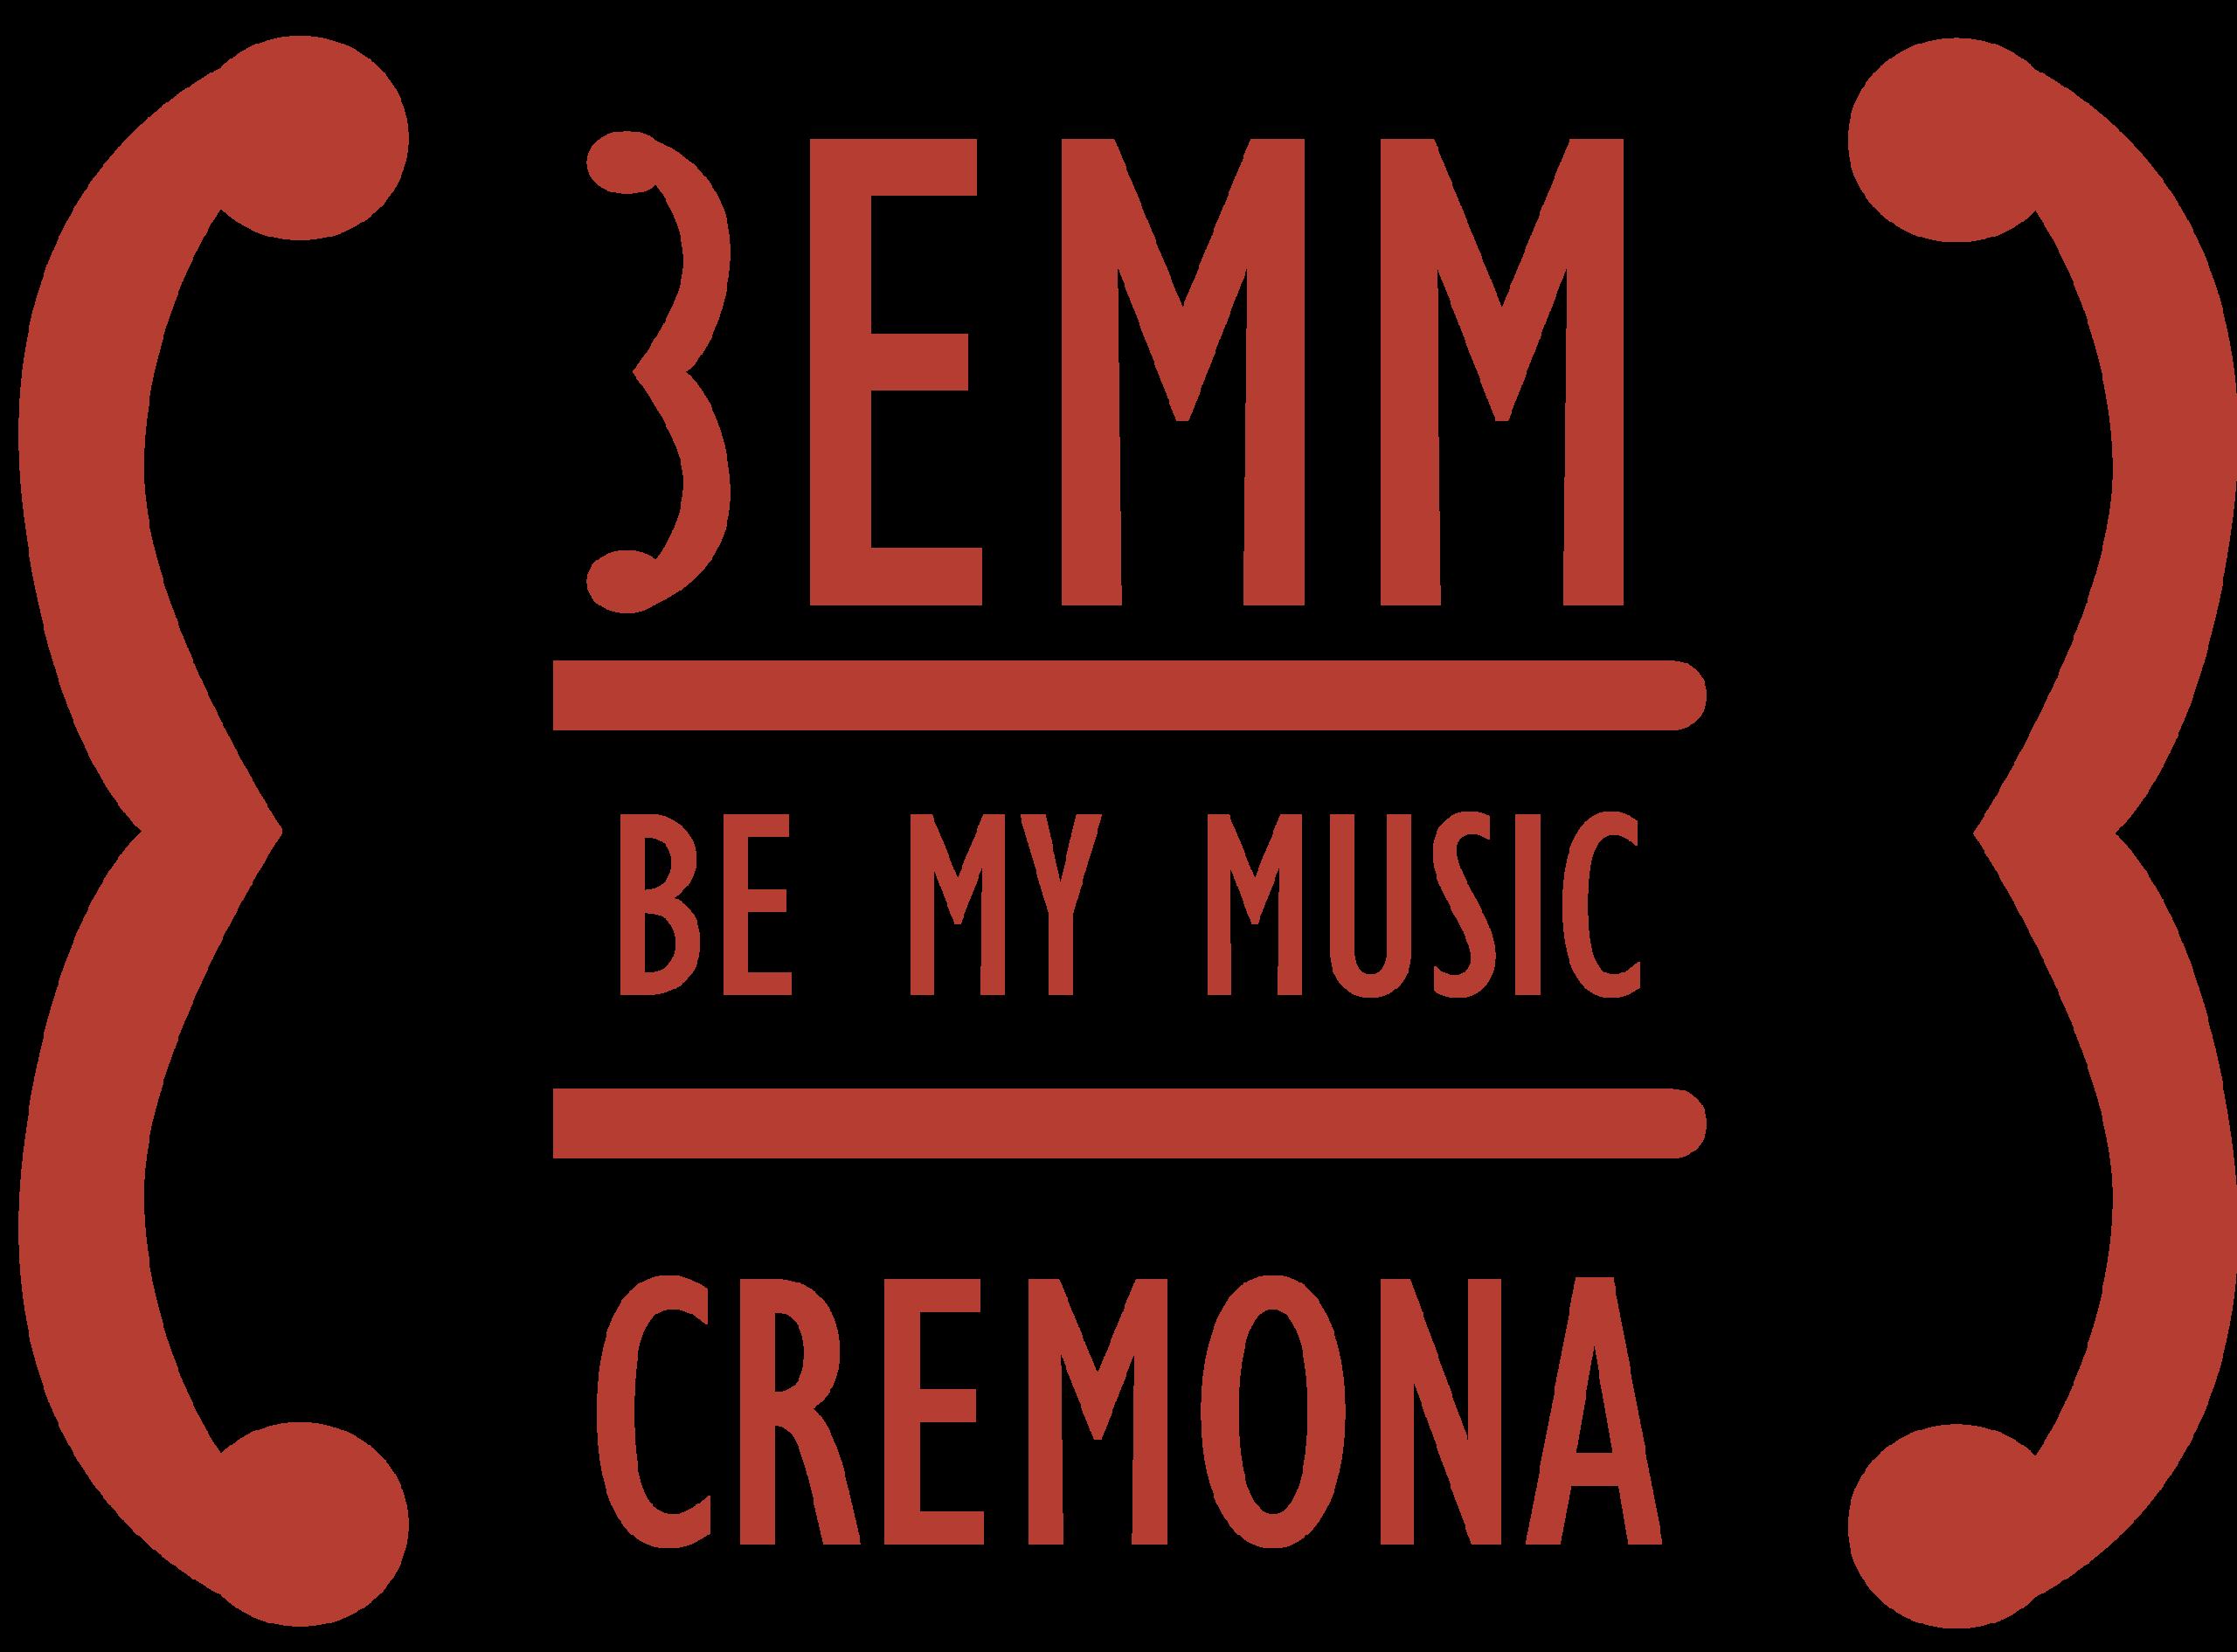 cropped-logo-BEMM-red-1.png